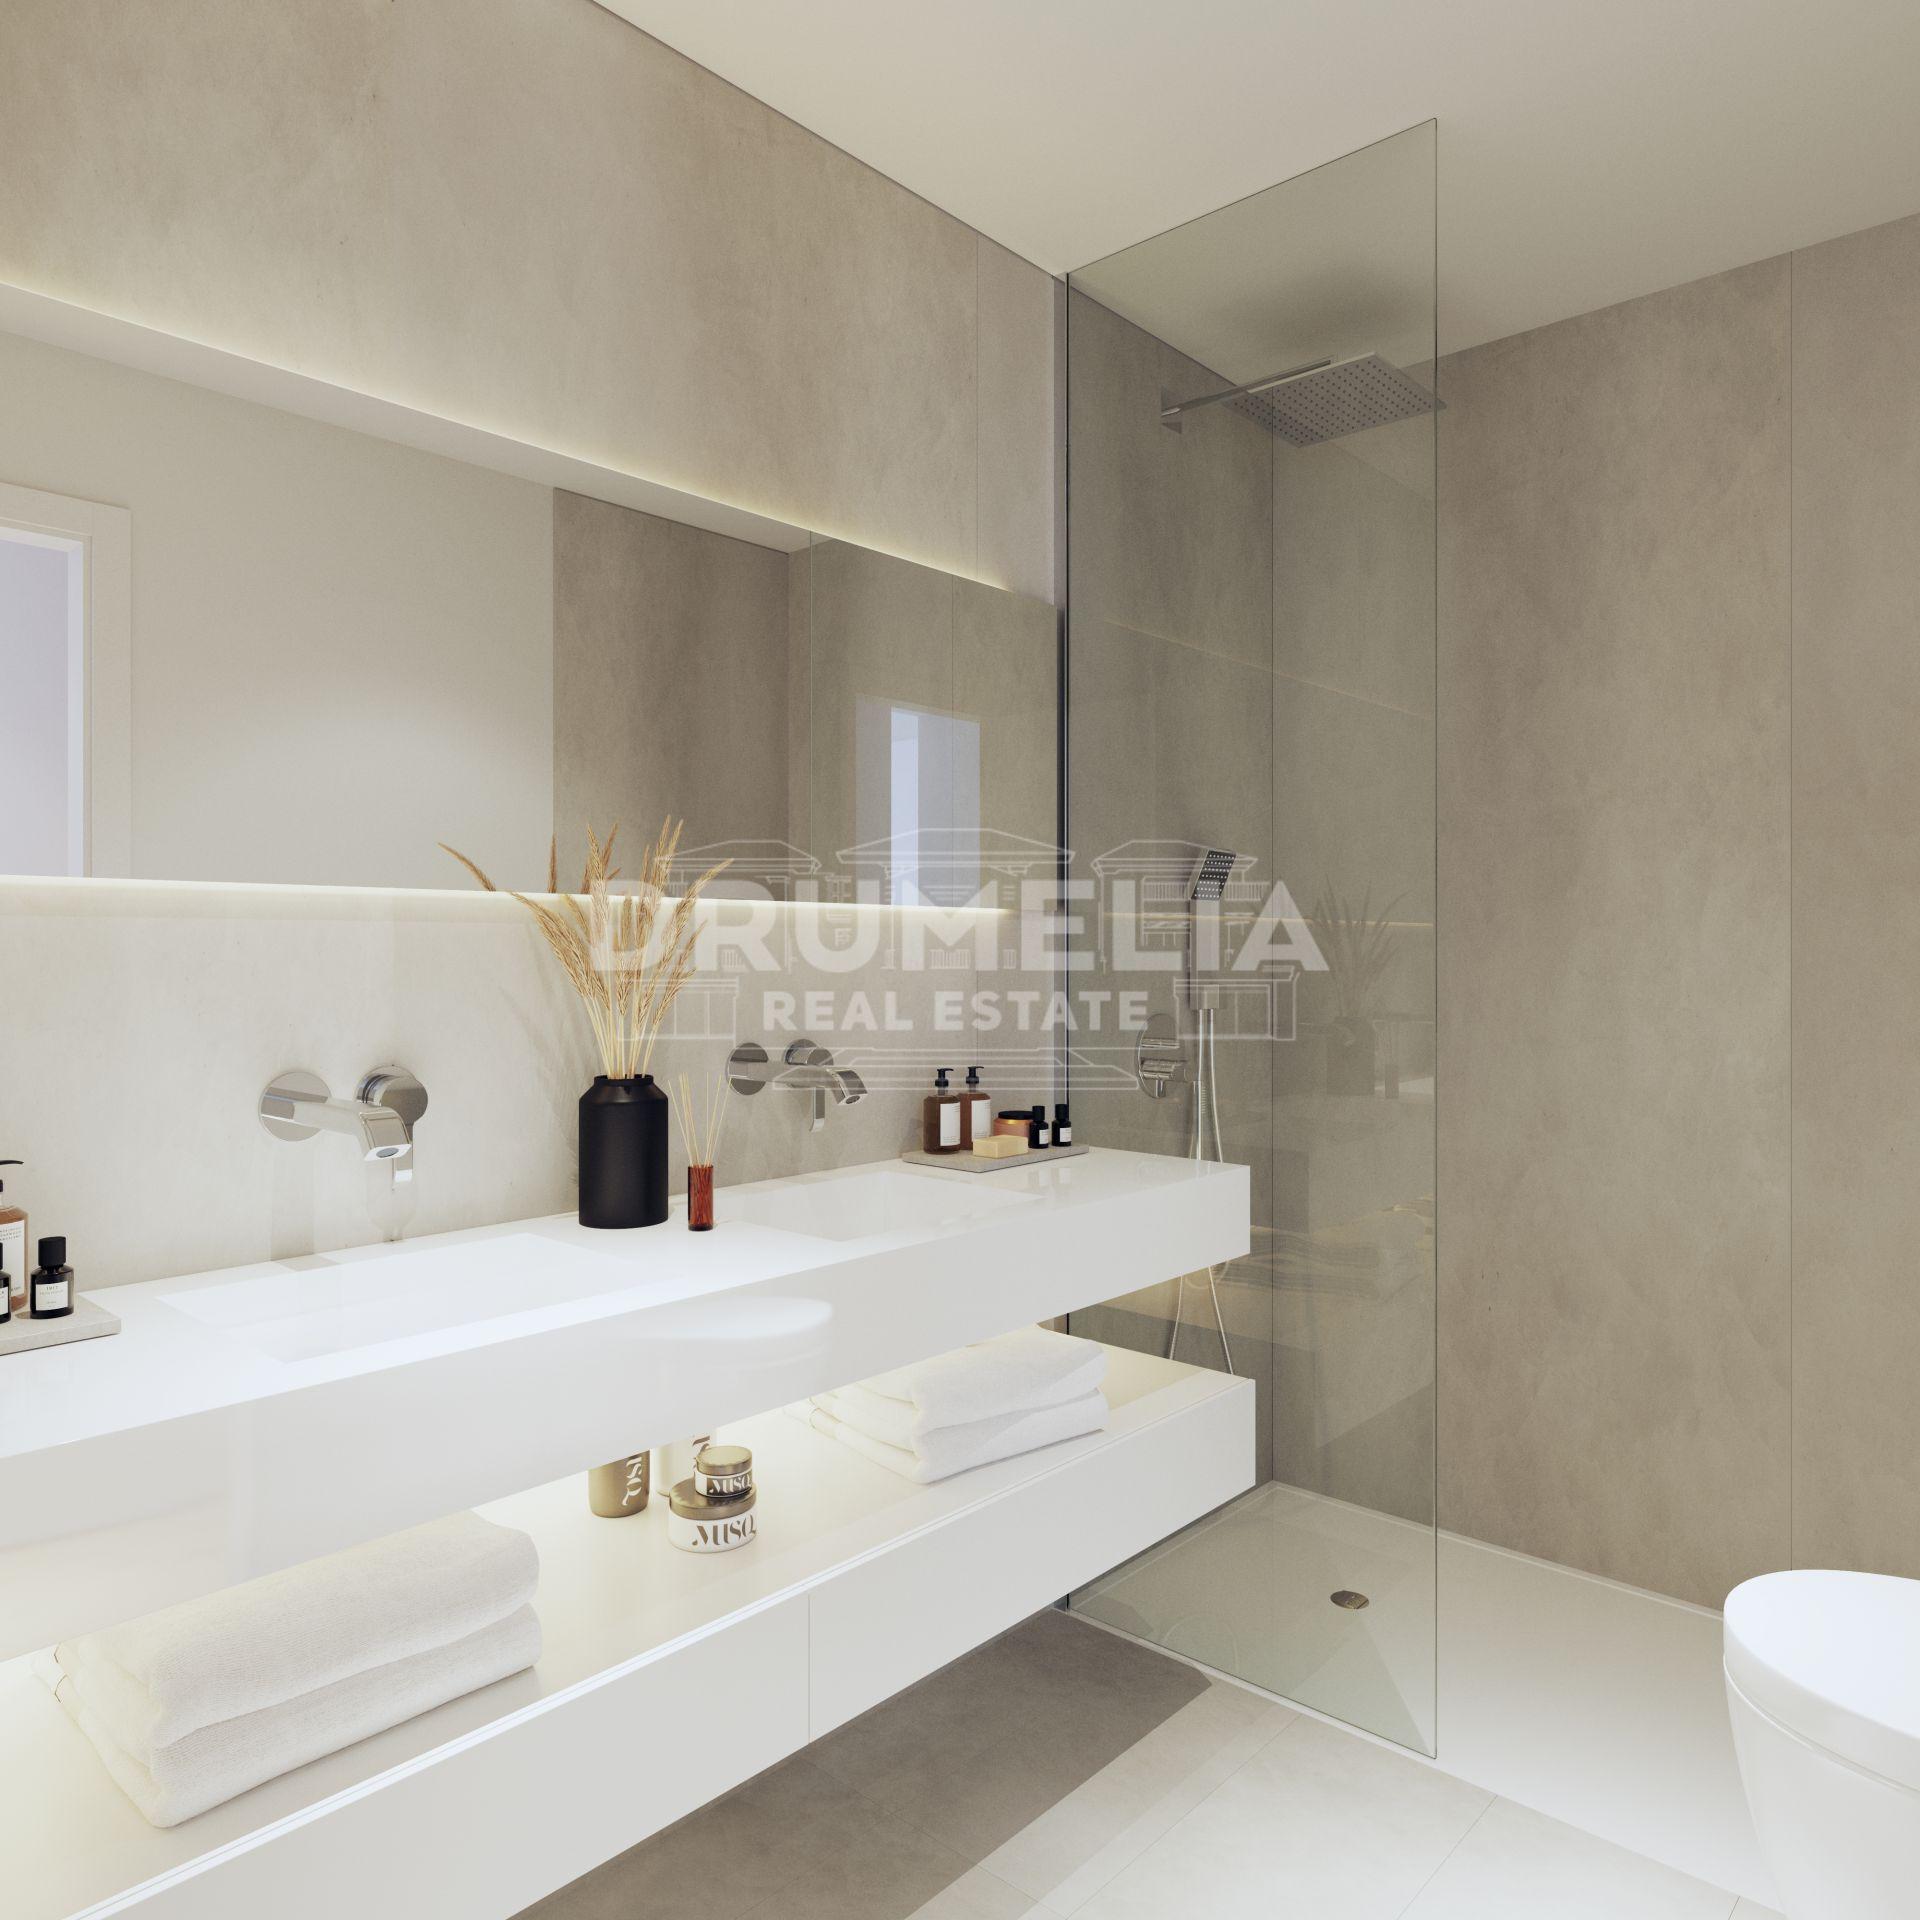 New Development Apartments For Sale In Cancelada, Estepona